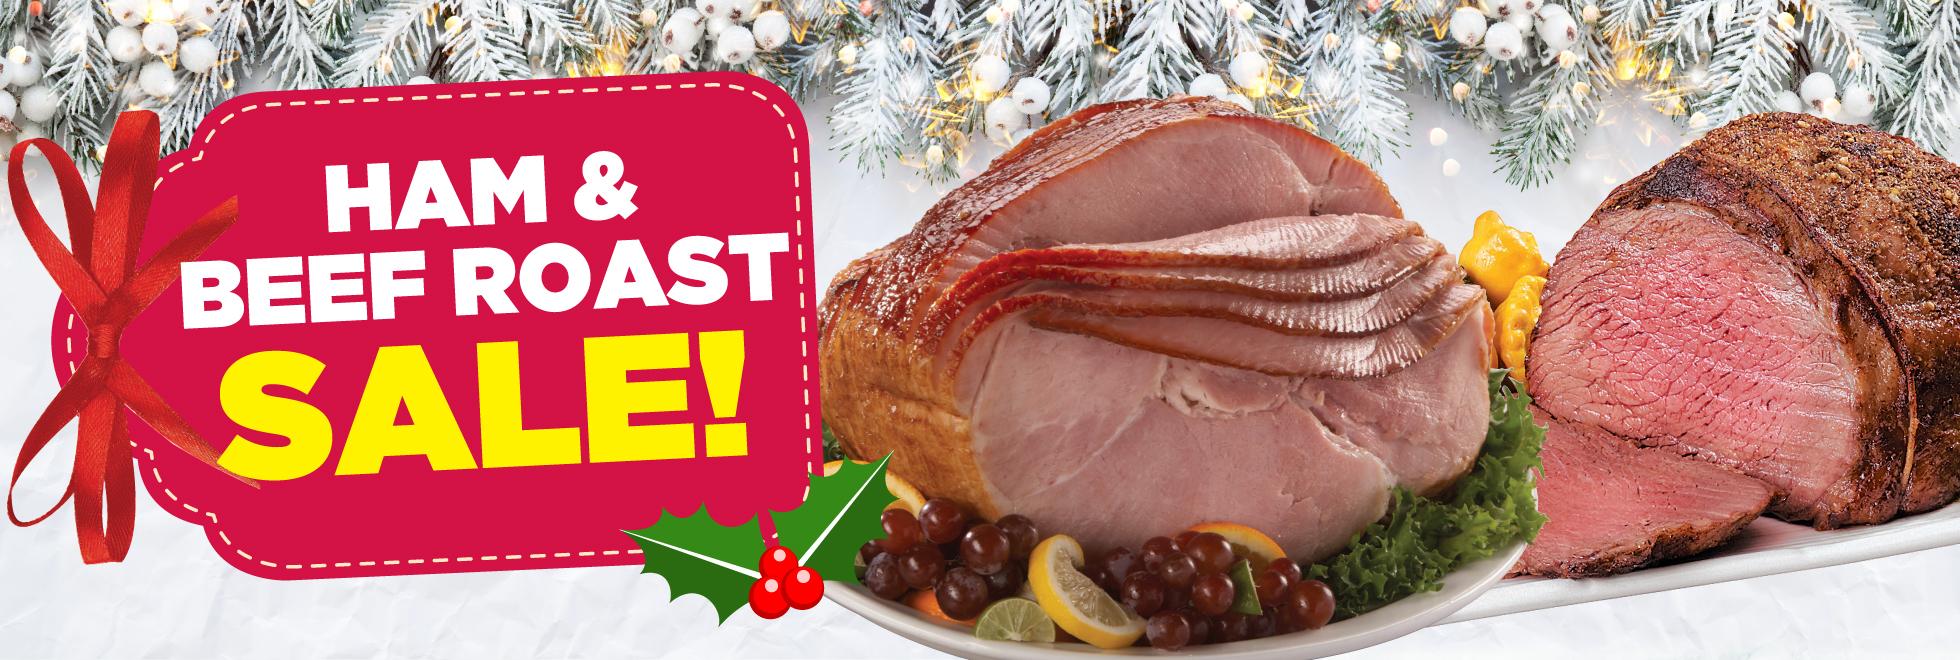 Merry Christmas Roast and Ham Savings